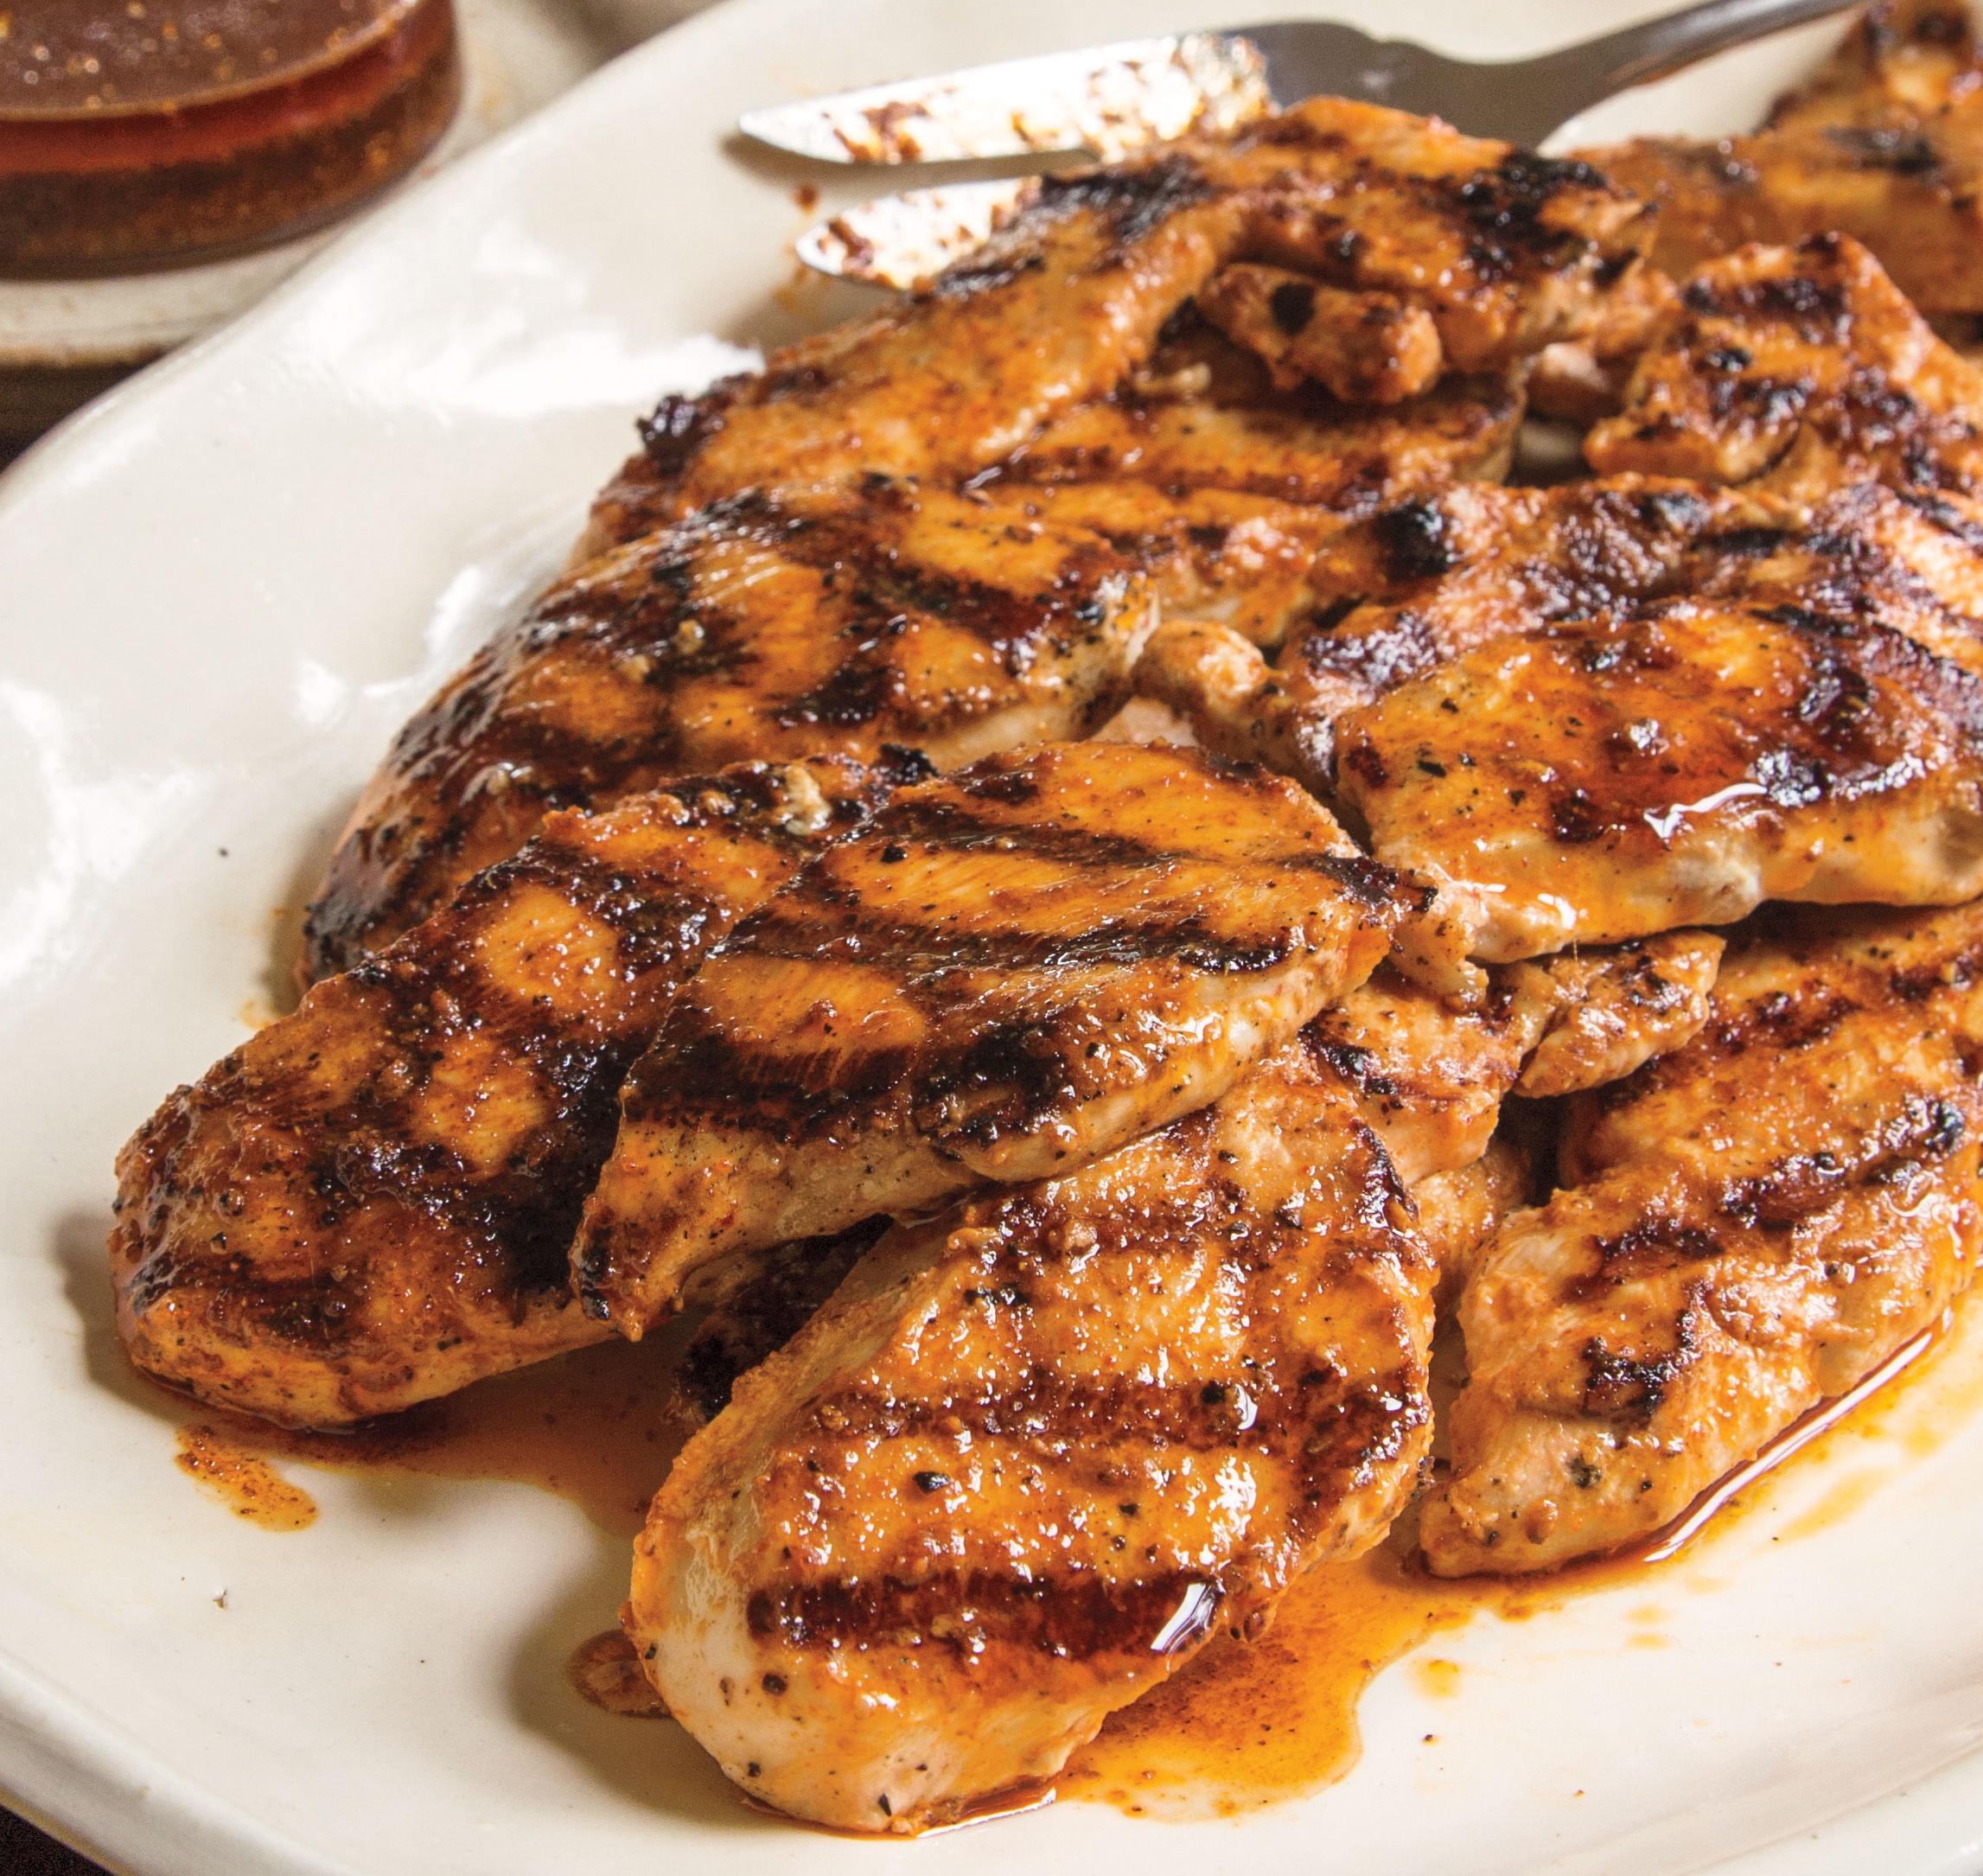 Crank It Up: Make This Nashville Hot Grilled Chicken